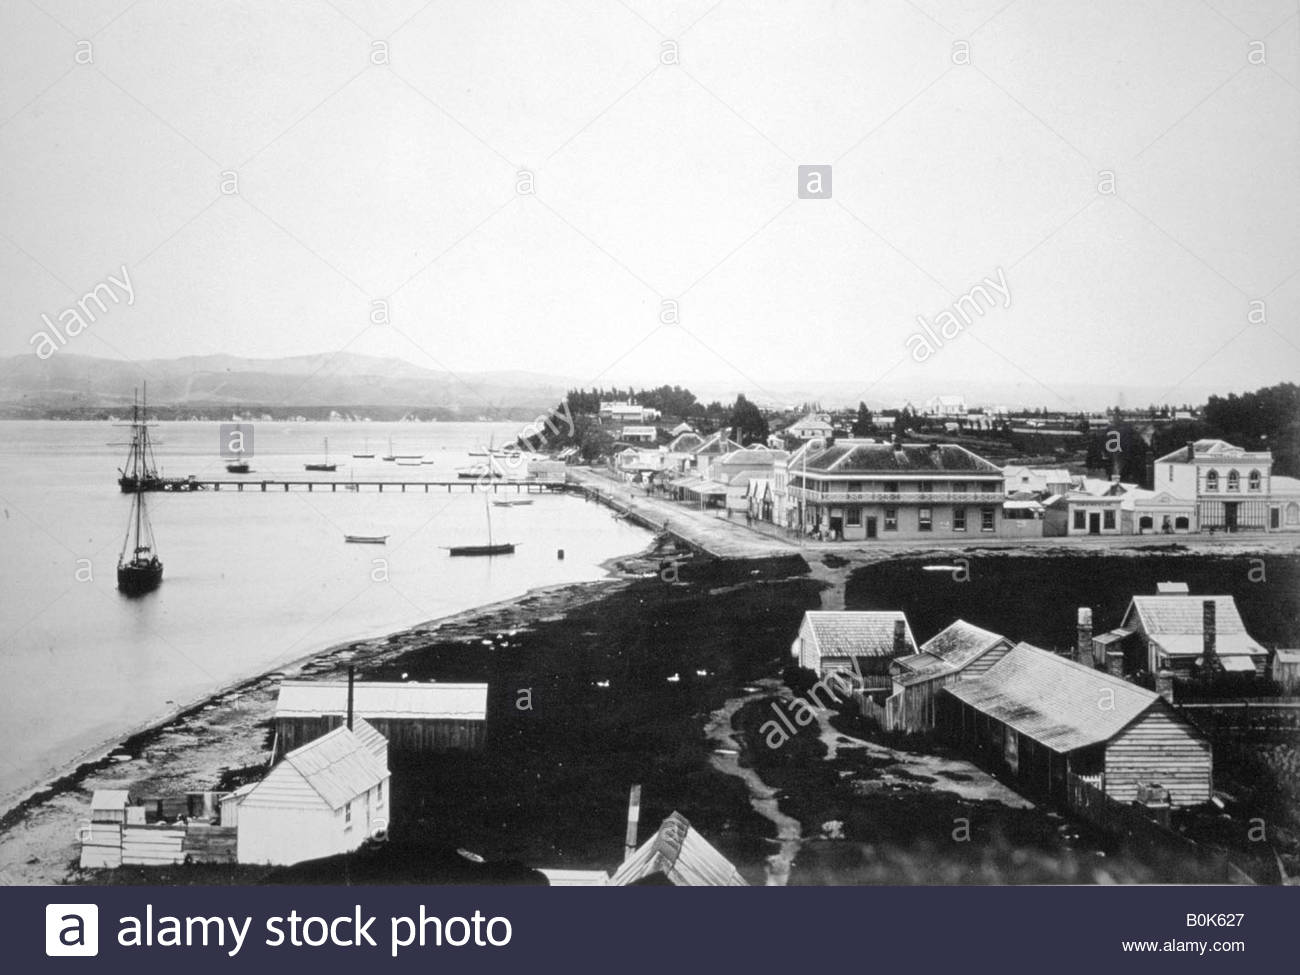 Tauranga, Bay of Plenty, North Island, New Zealand, 1875. Stock Photo